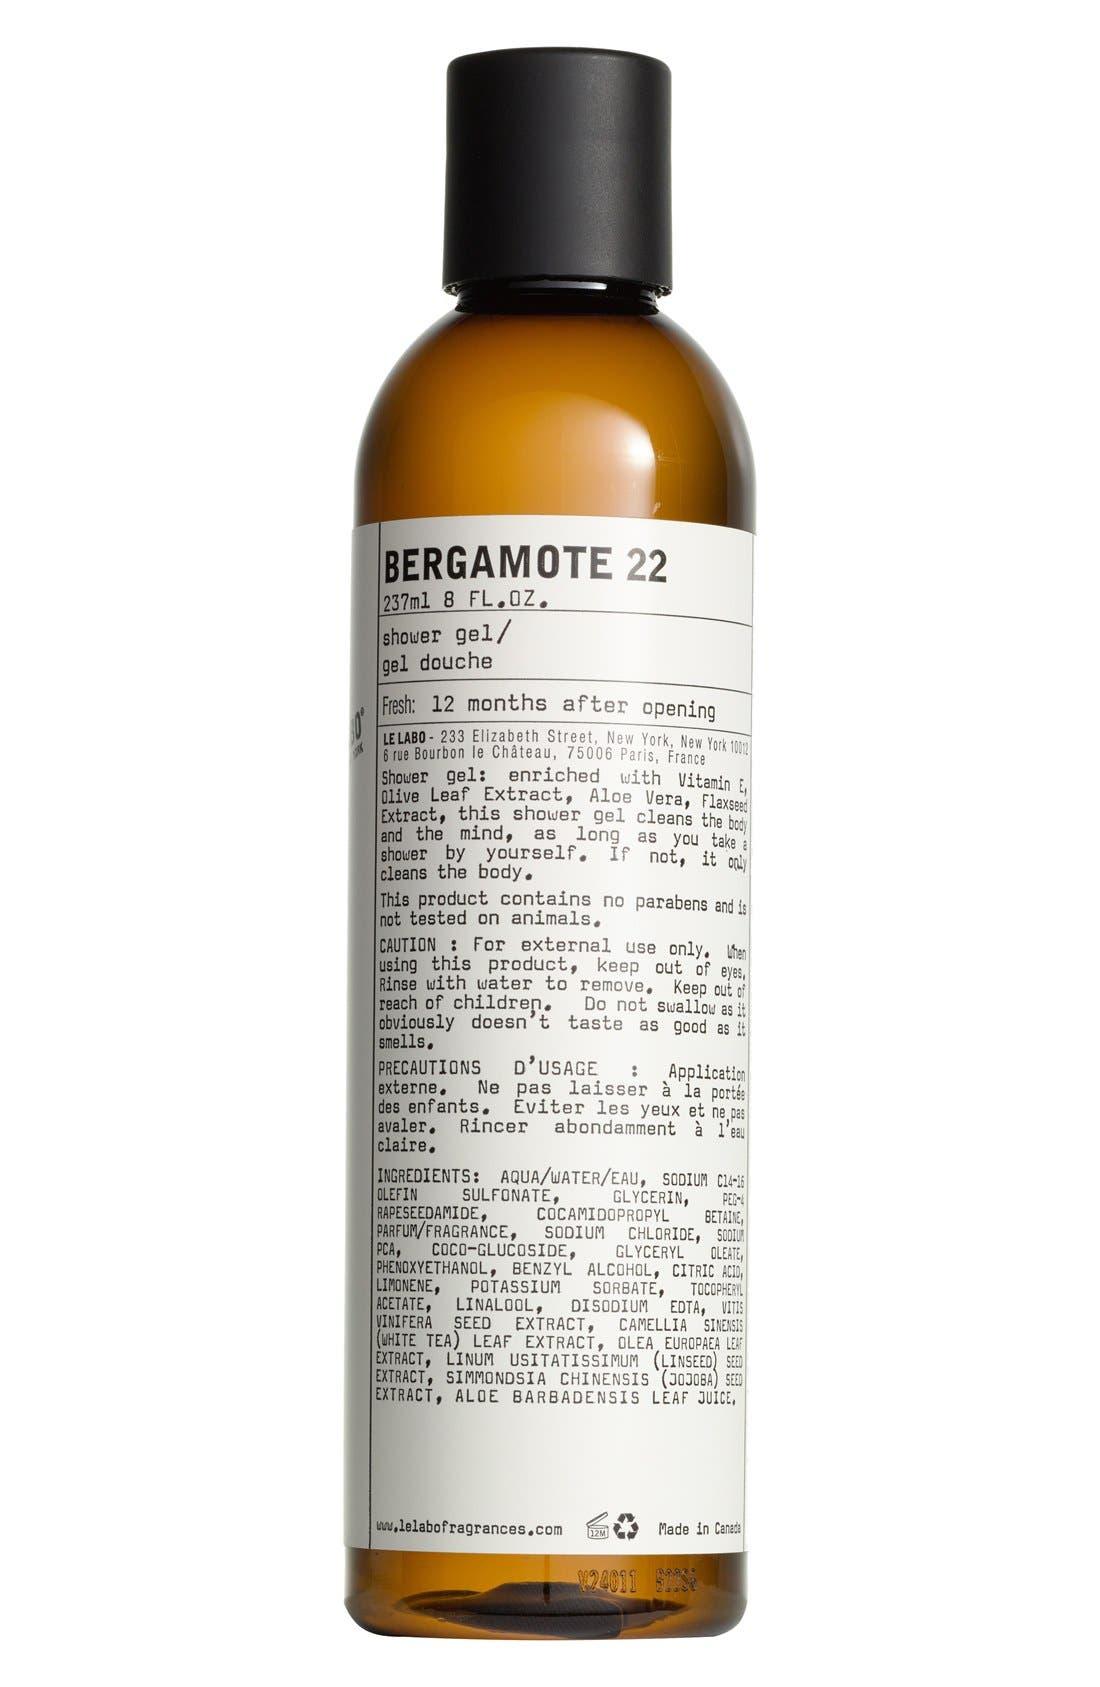 Le Labo 'Bergamote 22' Shower Gel